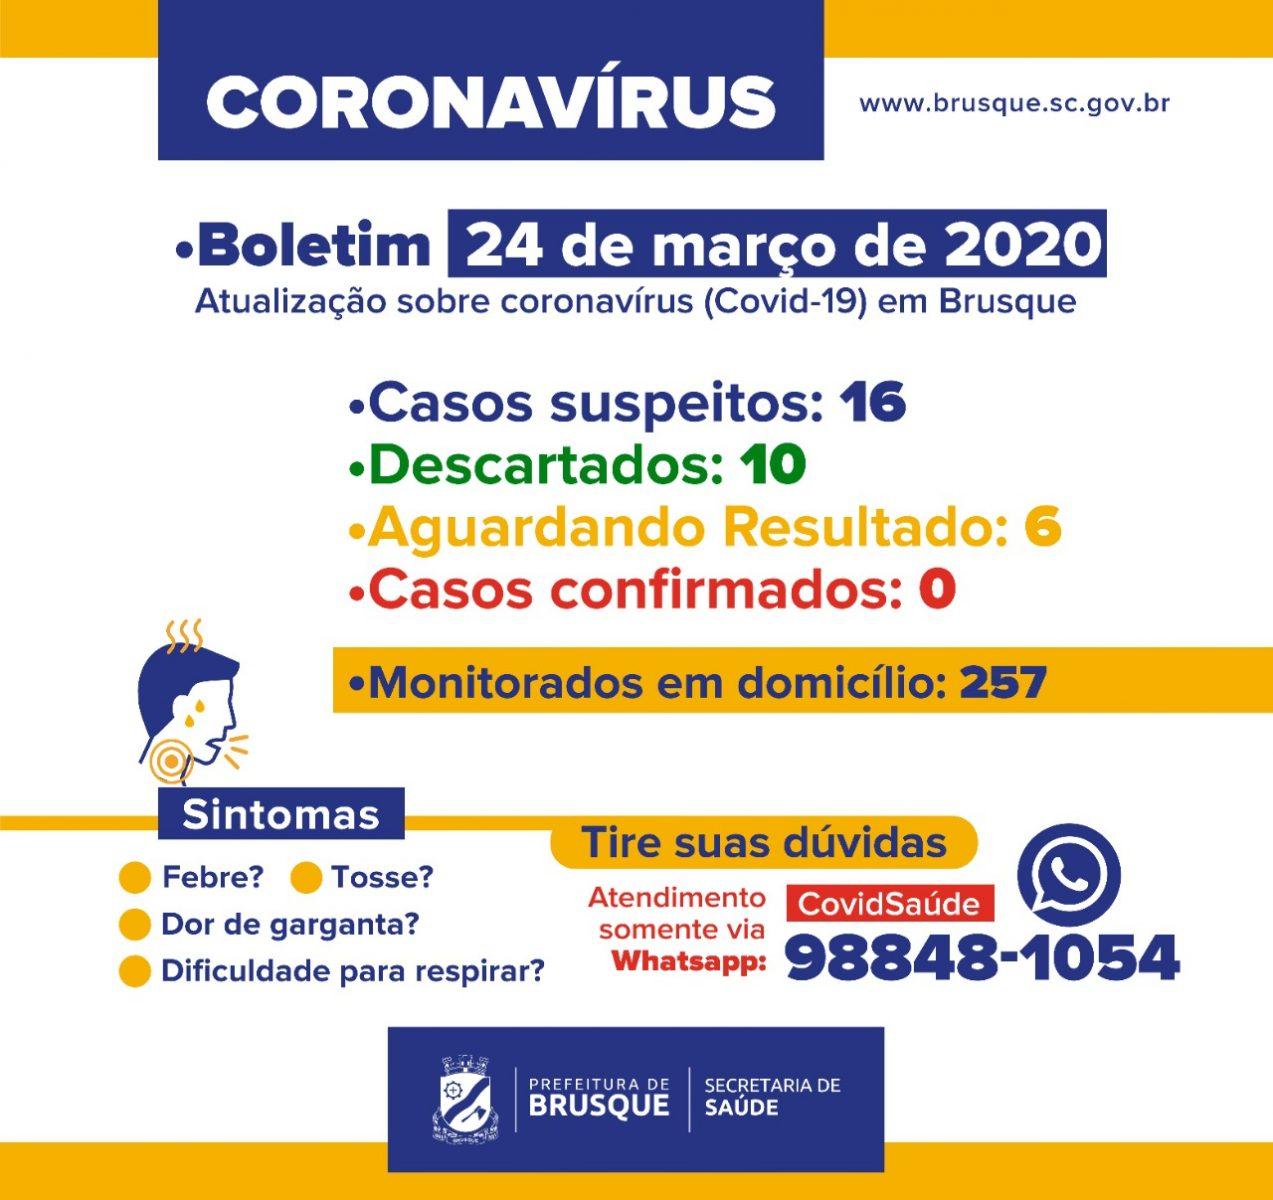 Confira o Boletim Epidemiológico da Prefeitura de Brusque desta terça-feira (24)